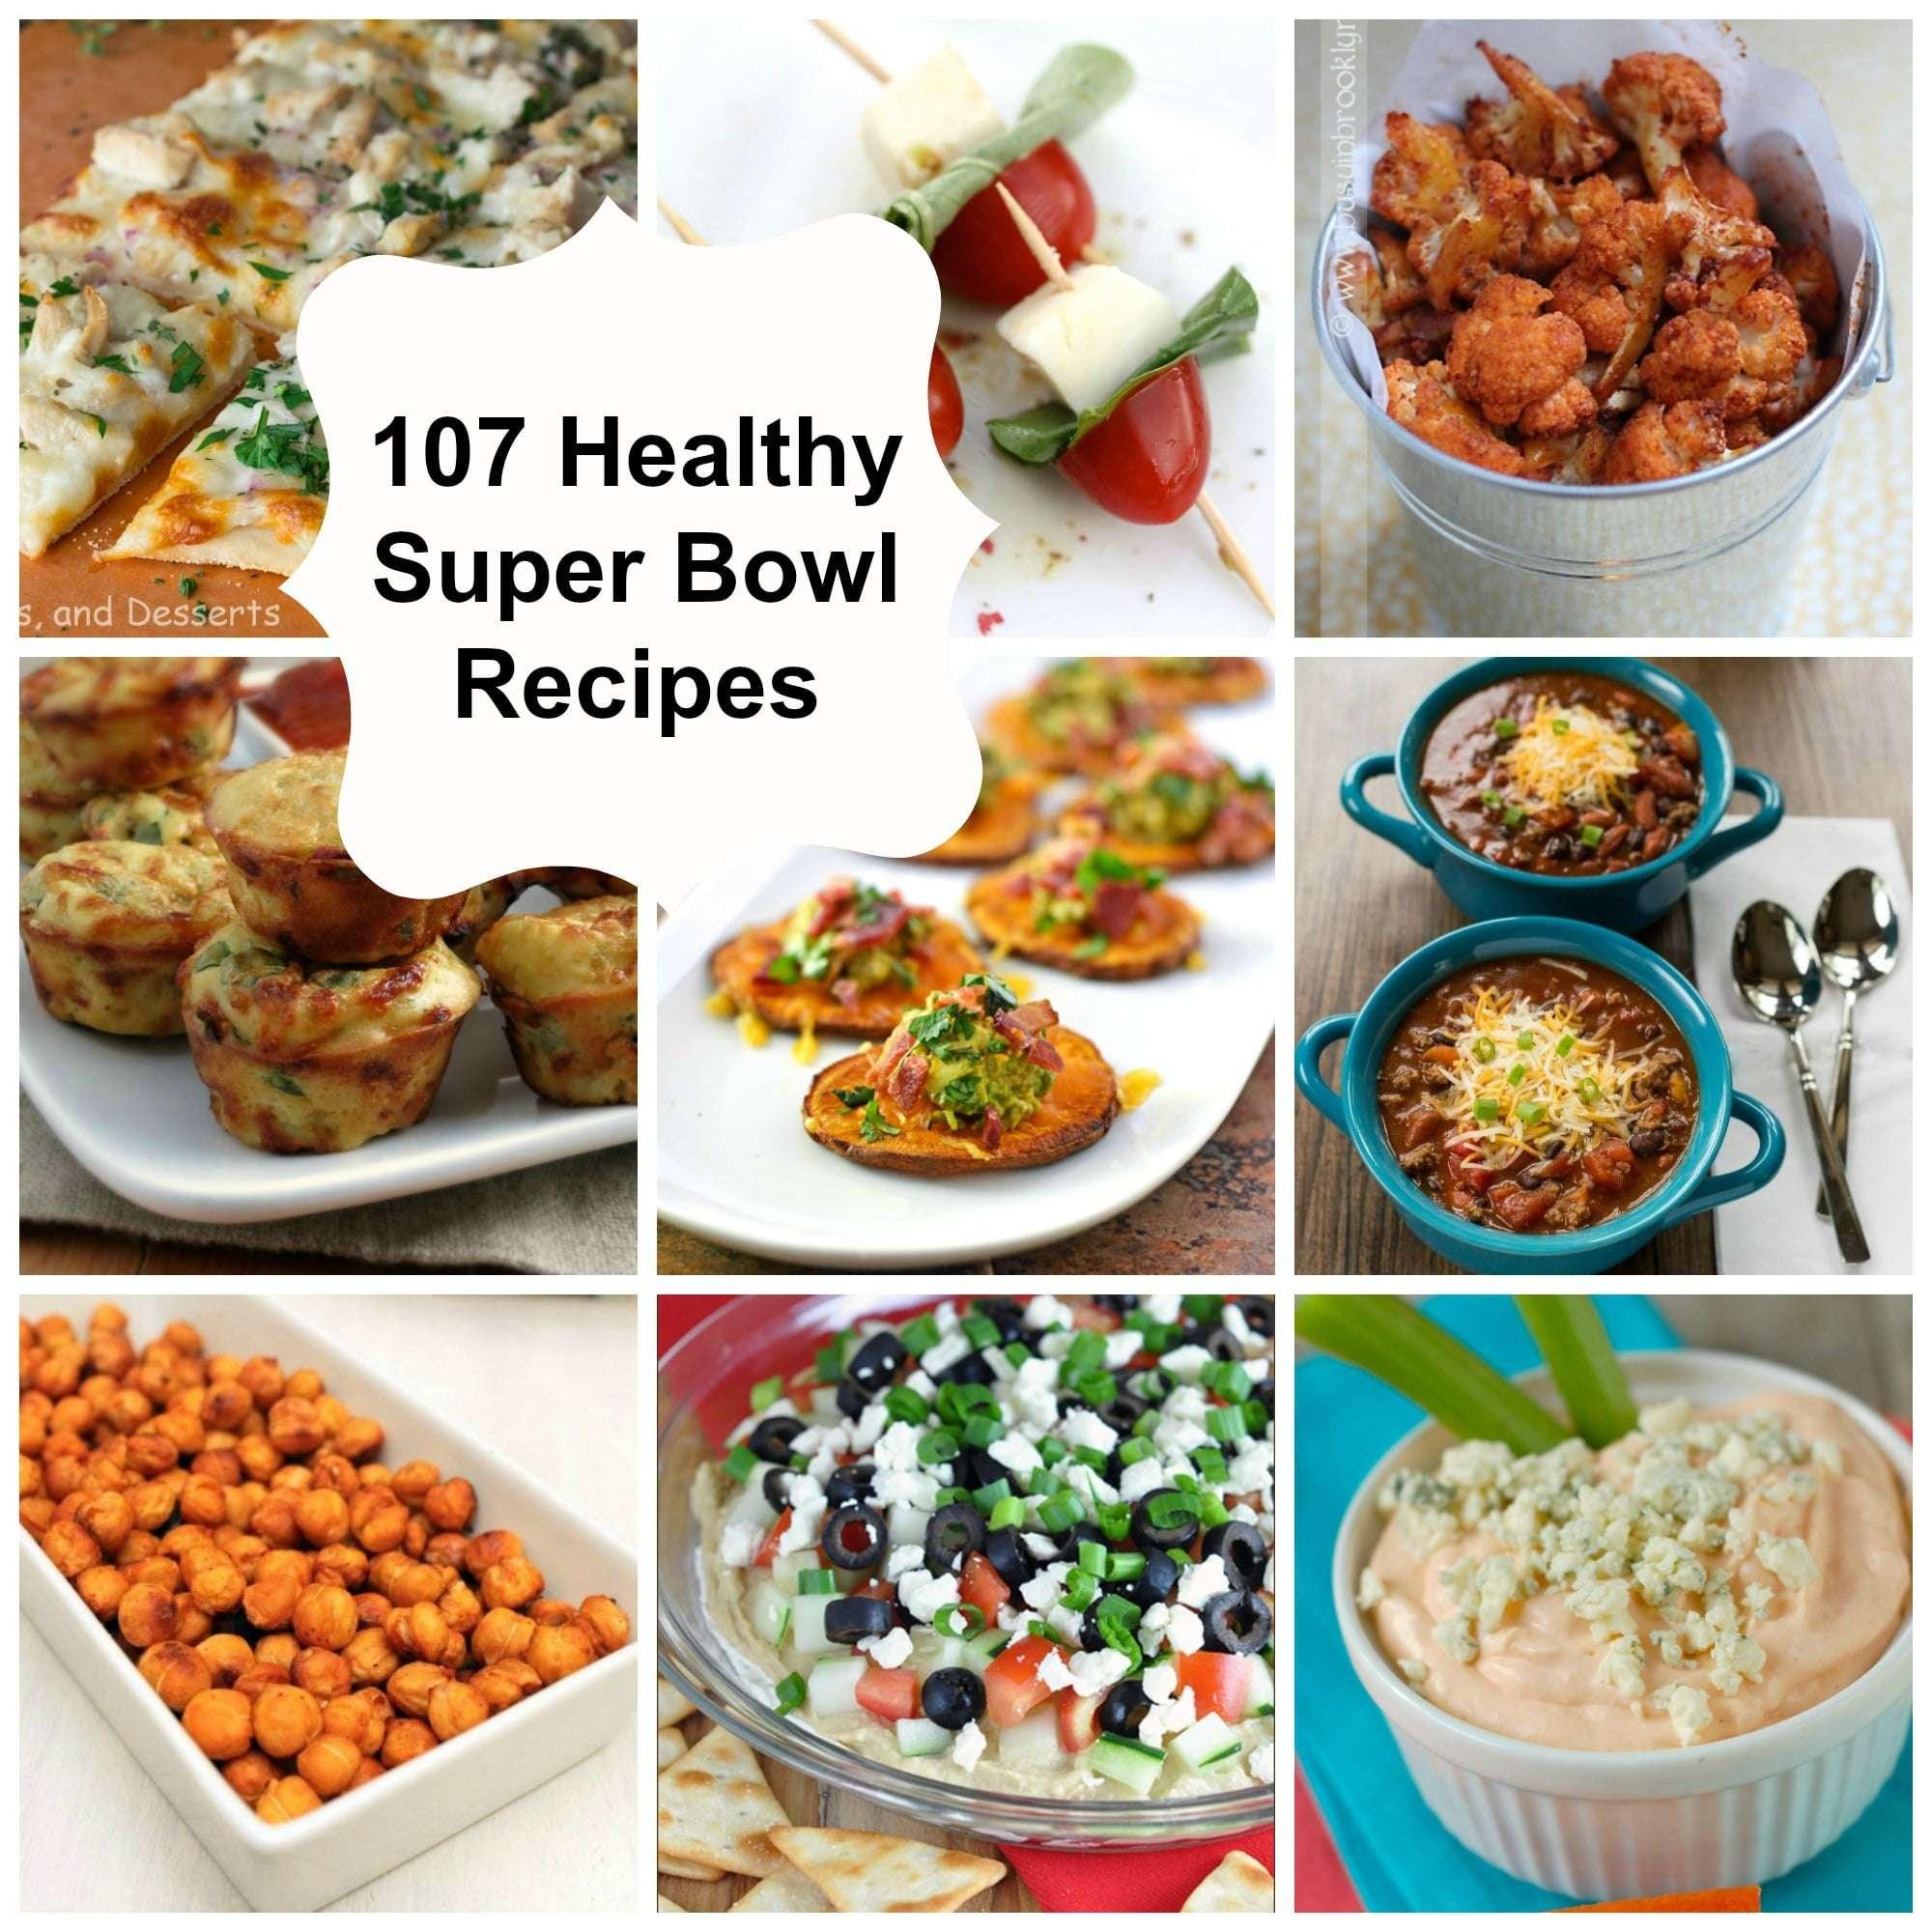 Healthy Snacks For Superbowl Party  107 Healthy Super Bowl Recipes A Cedar Spoon